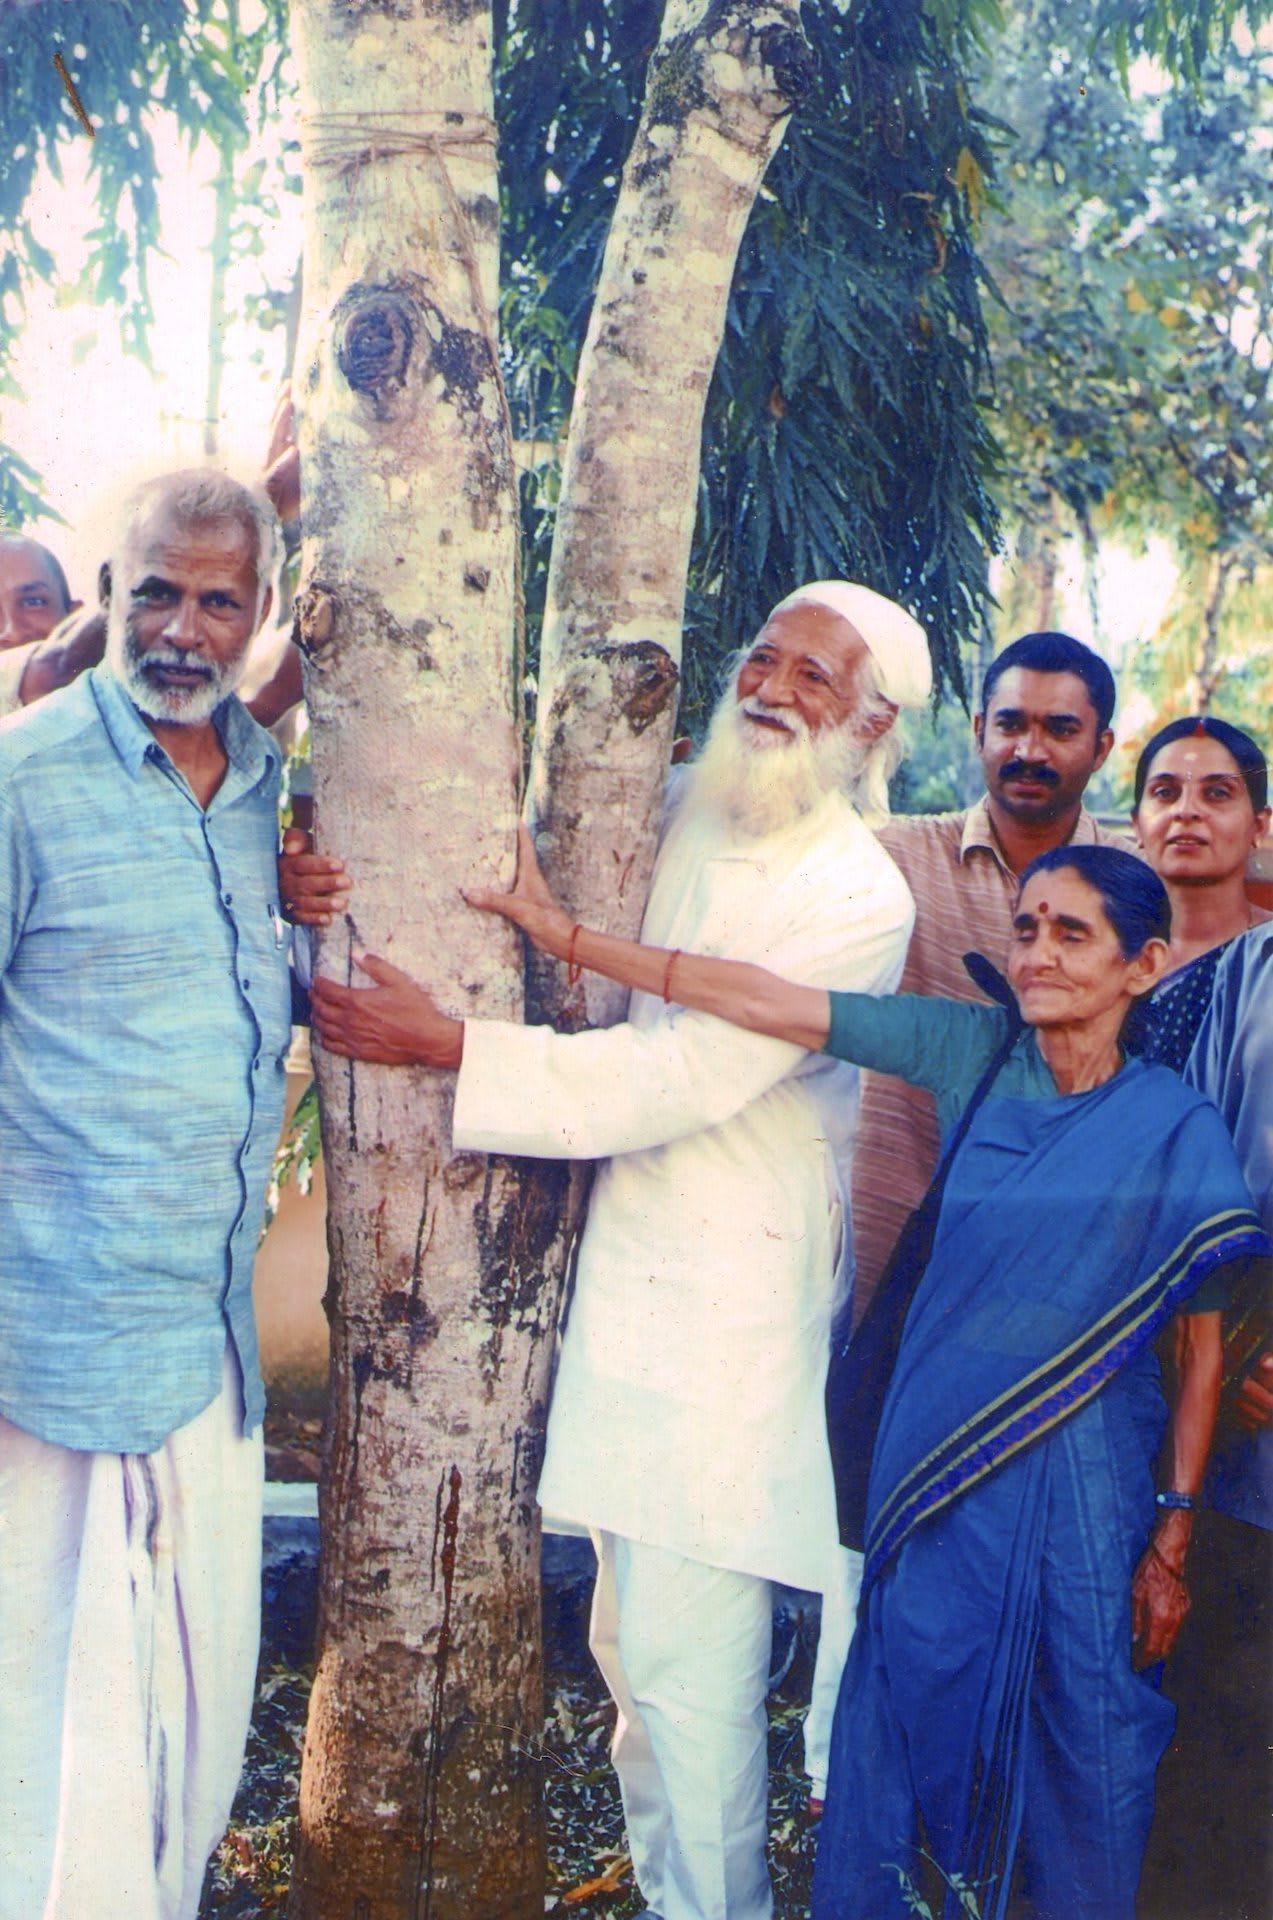 Chipko Movement Sunderlal Bahuguna hugging a tree